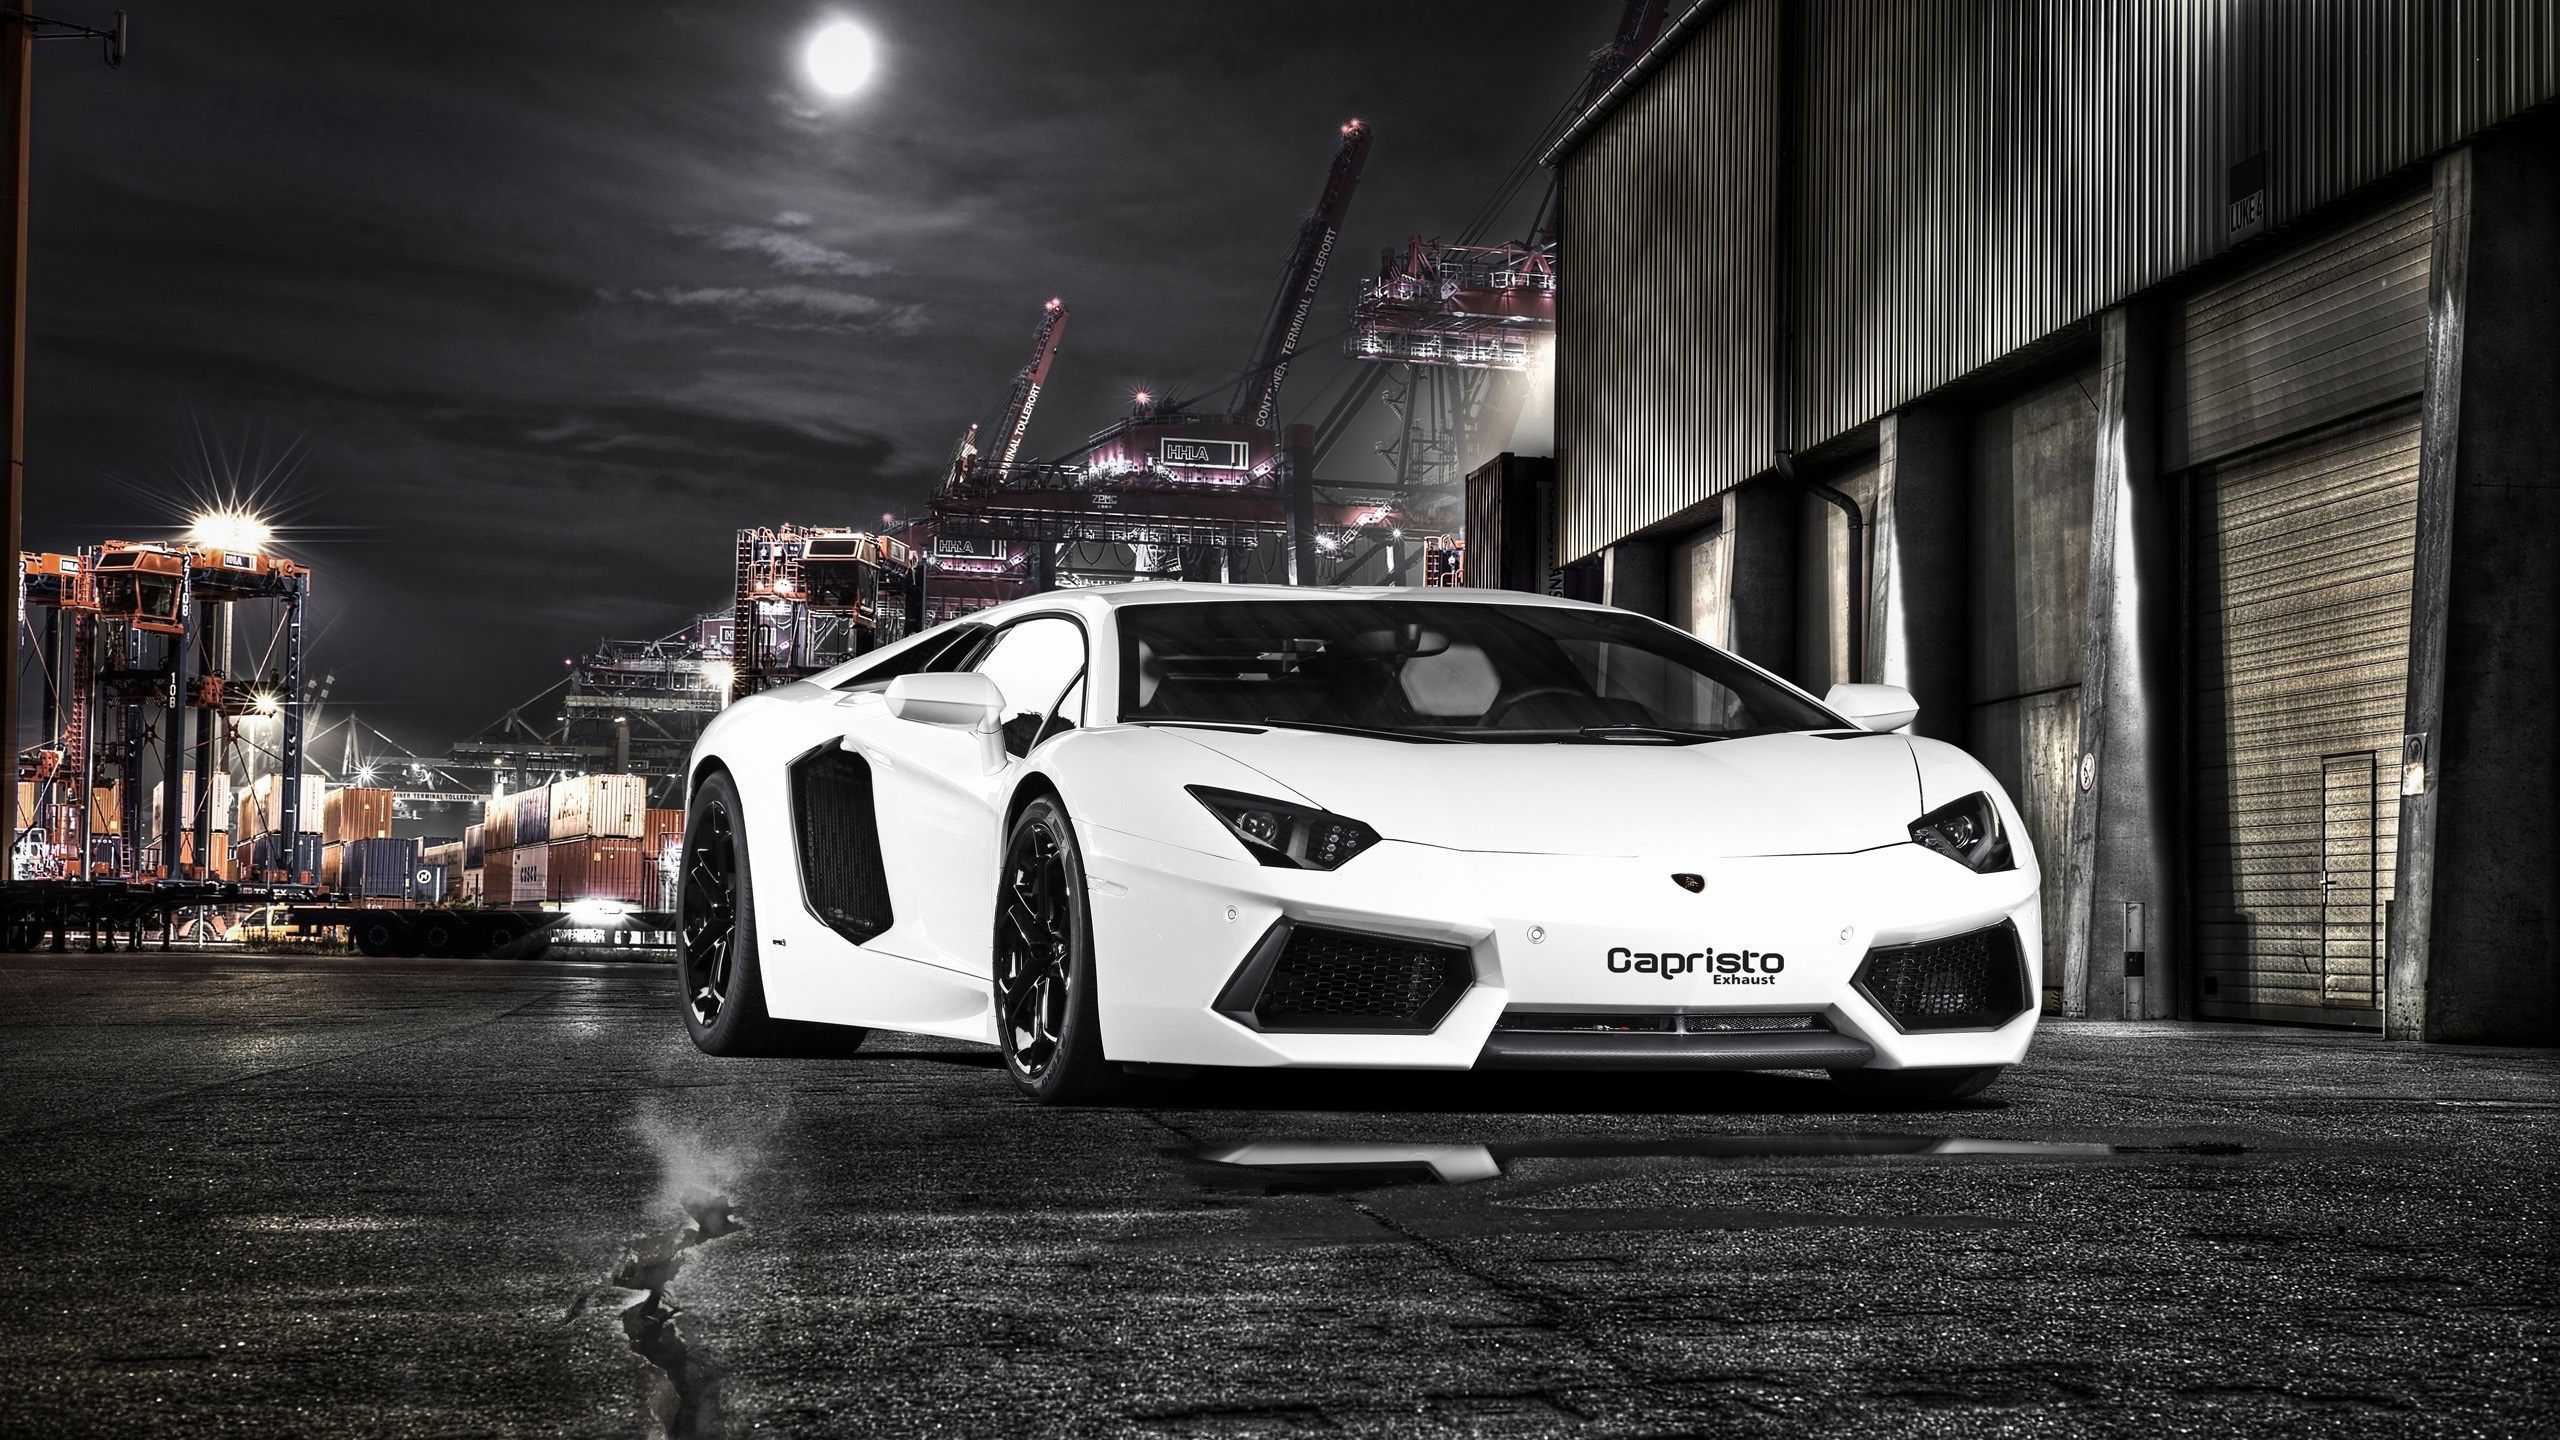 Lamborghini Aventador Full HD Bakgrund and Bakgrund | 2560x1440 | ID